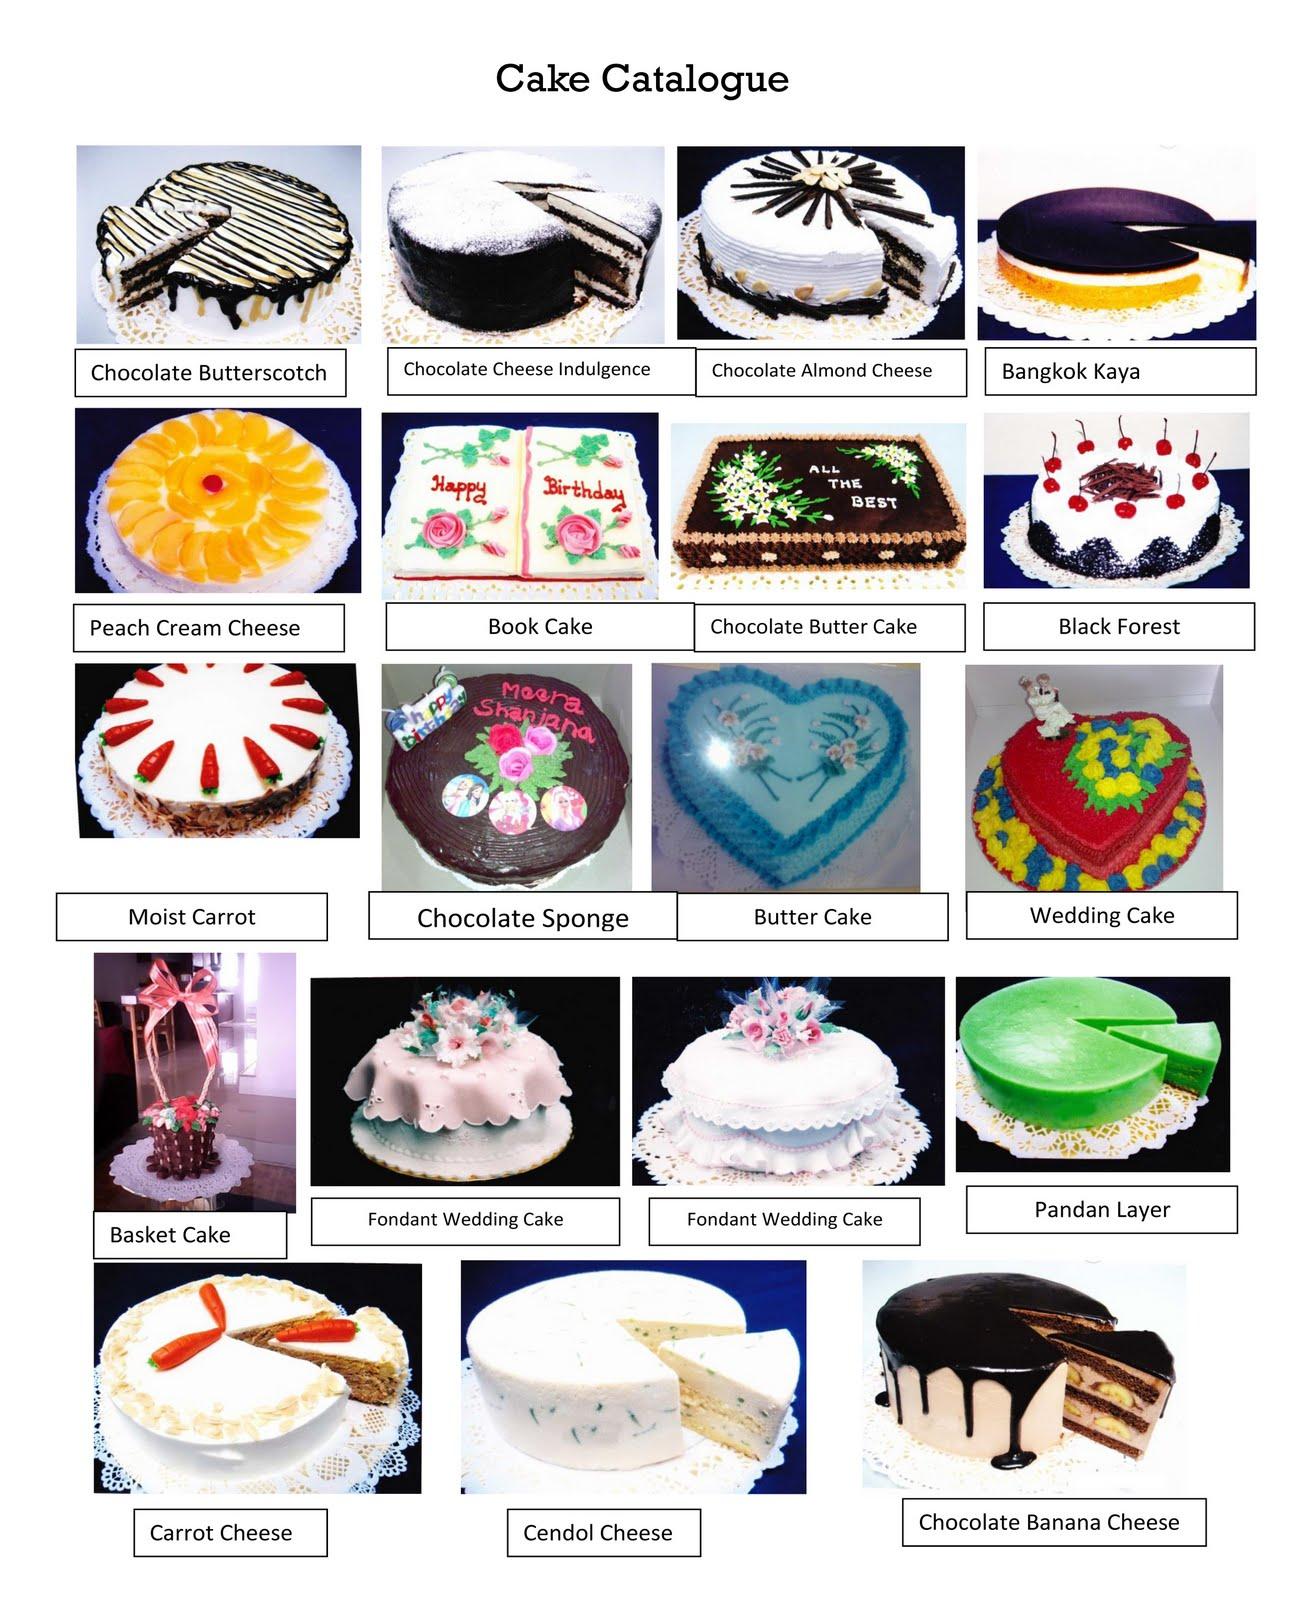 Shanti S Homemade Cakes Cake Catalogue